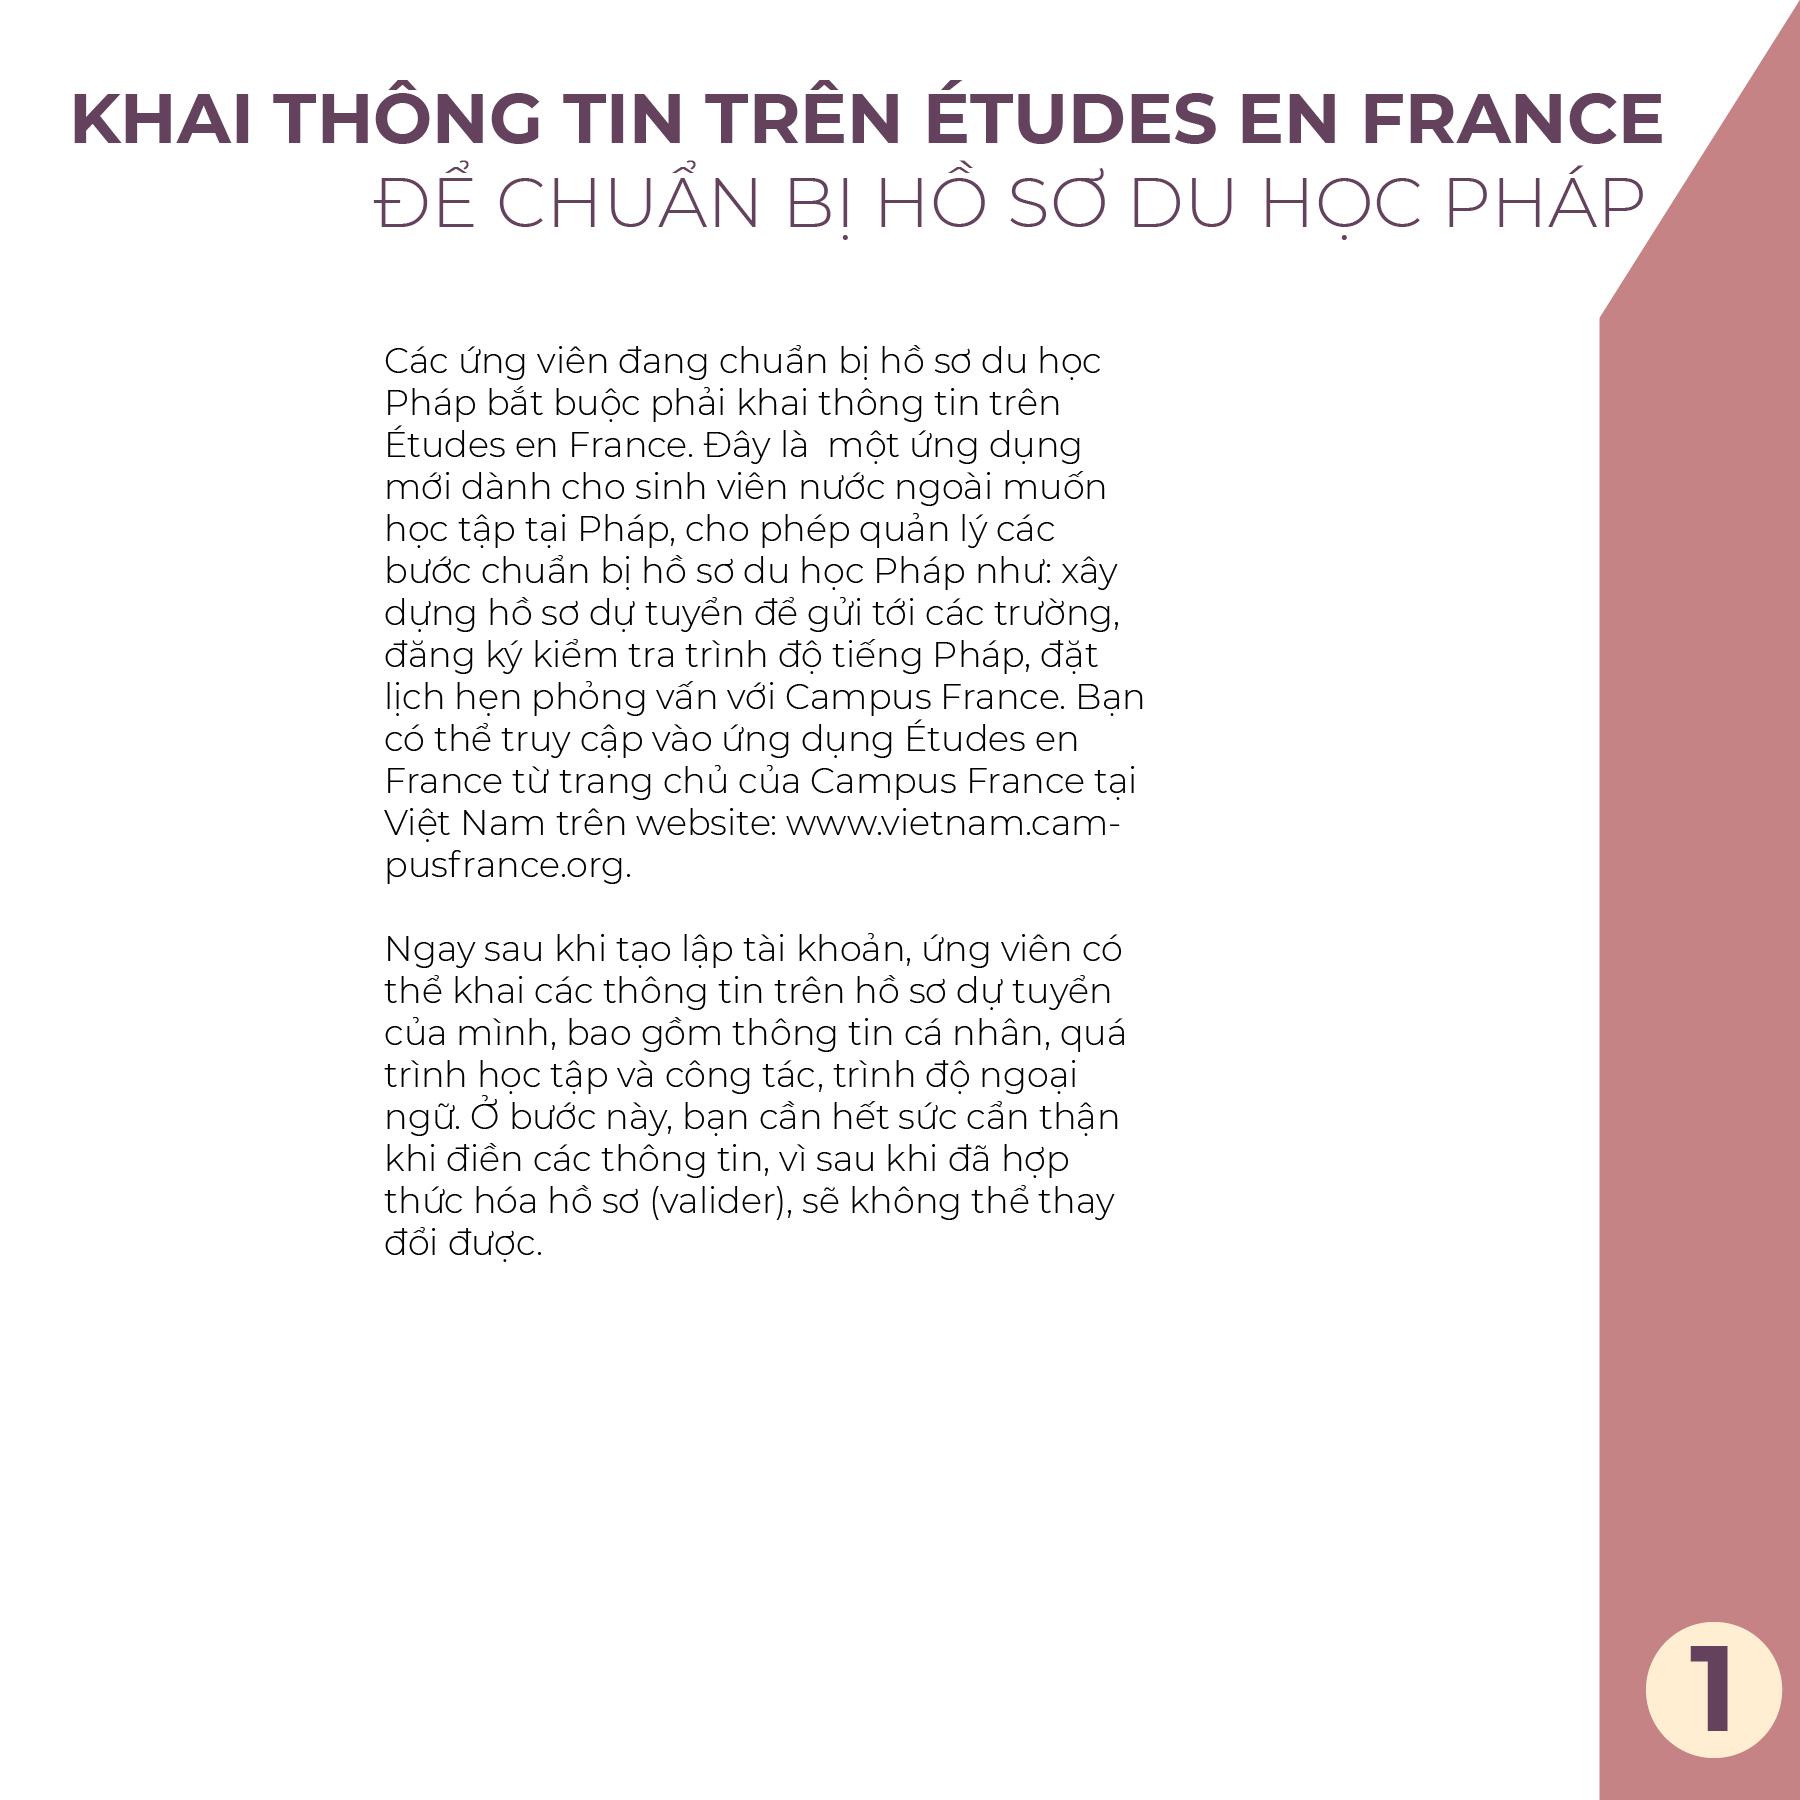 Hồ sơ du học Pháp